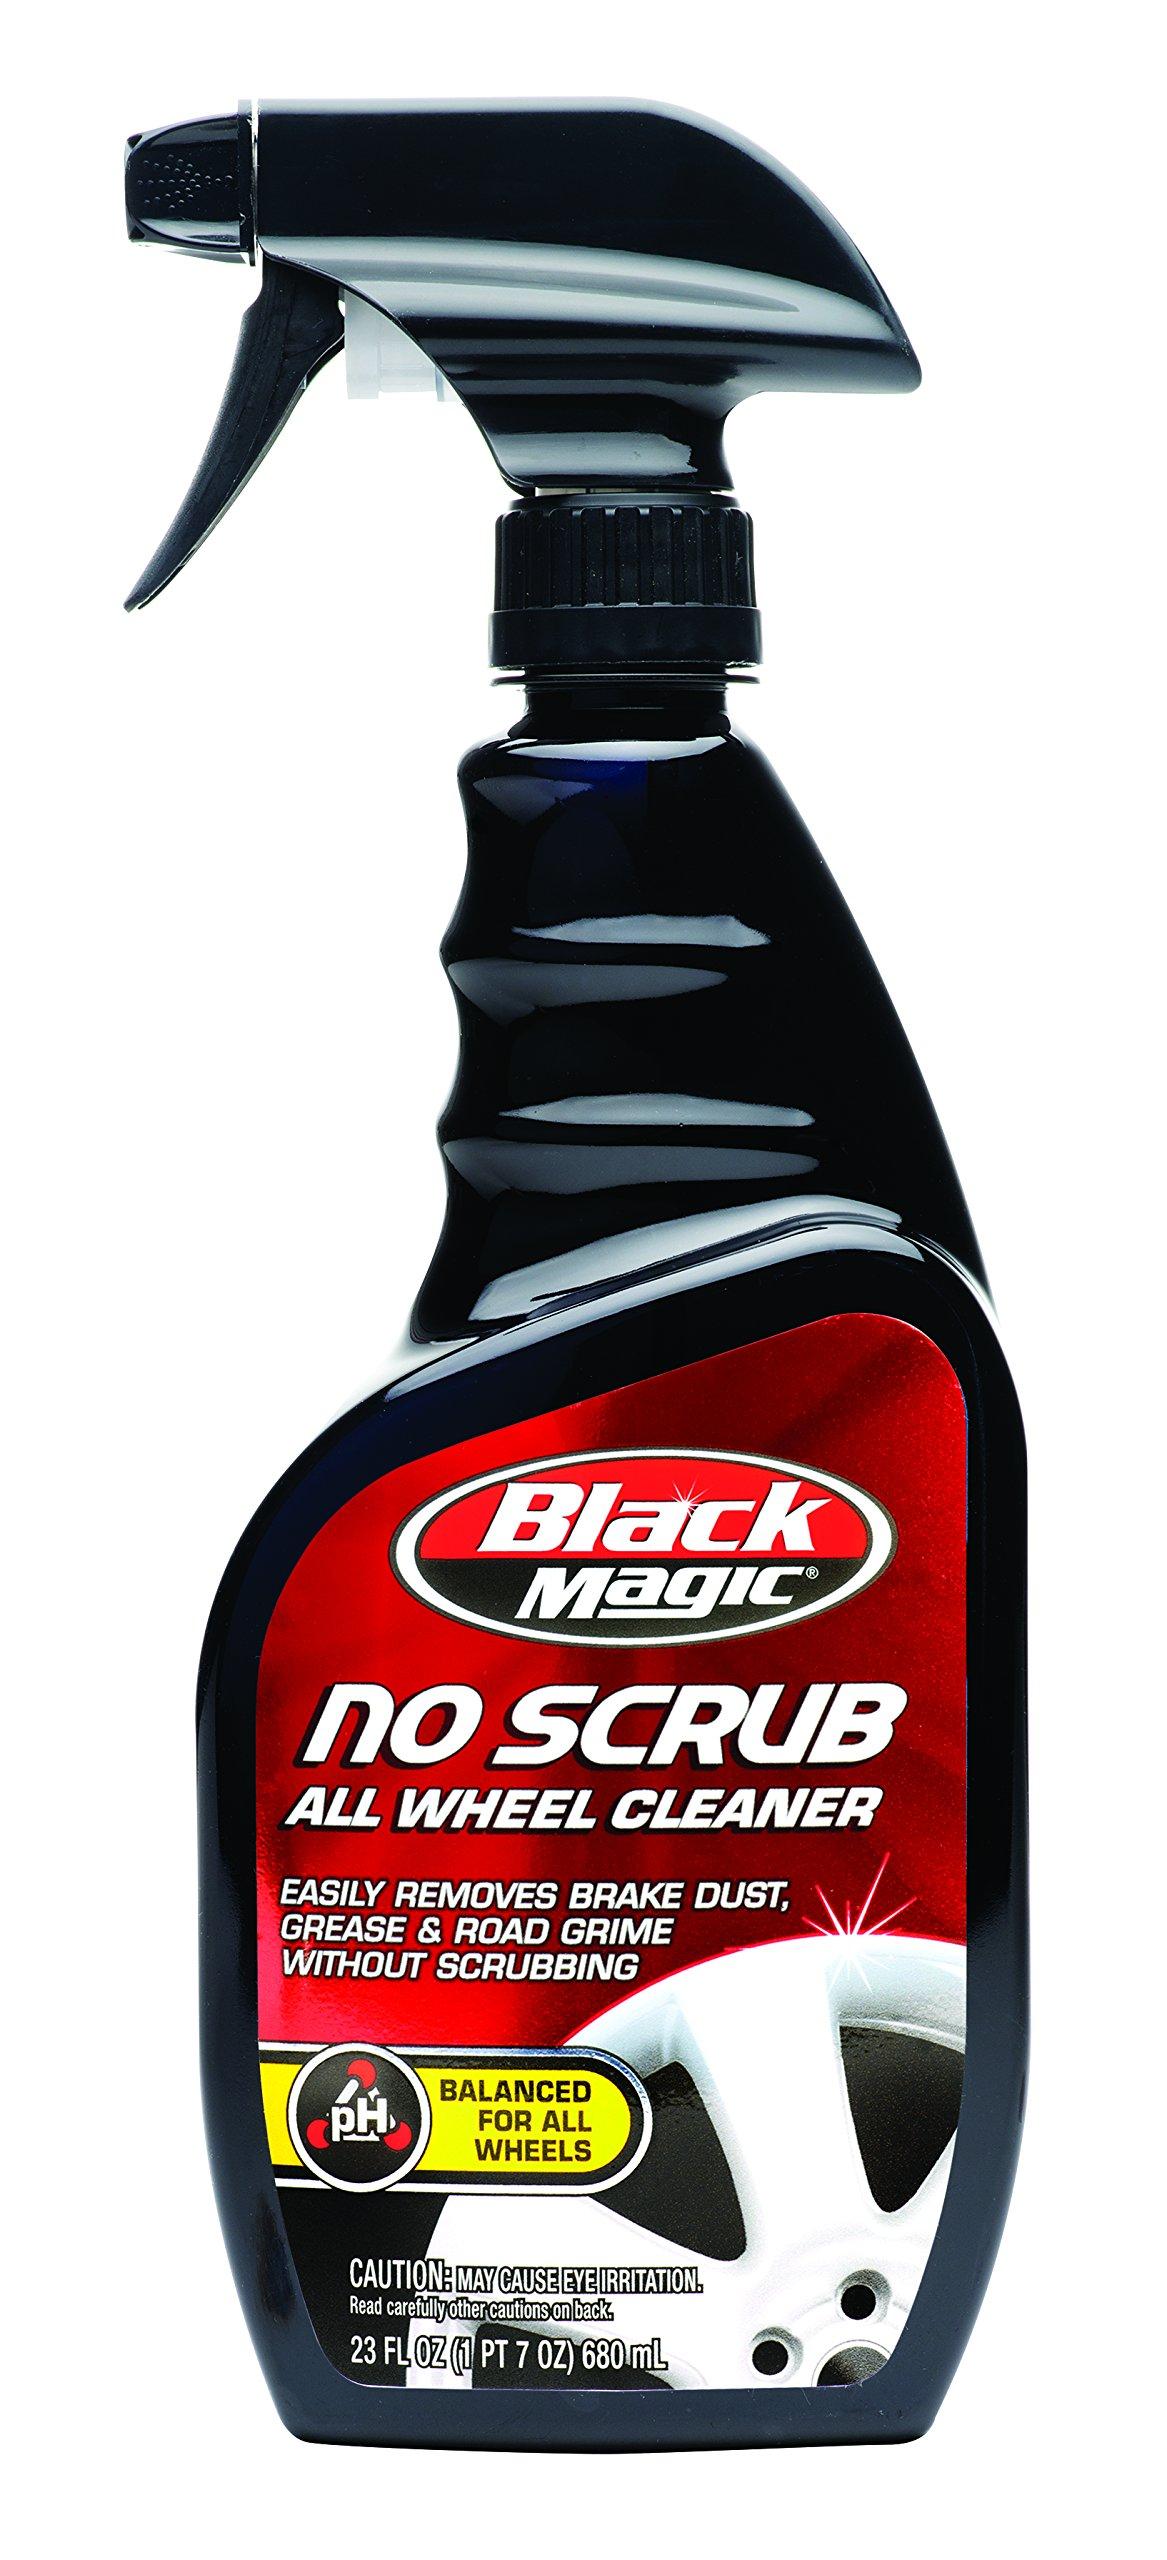 Black-Magic-BM41023-No-Scrub-All-Wheel-Cleaner-23-oz